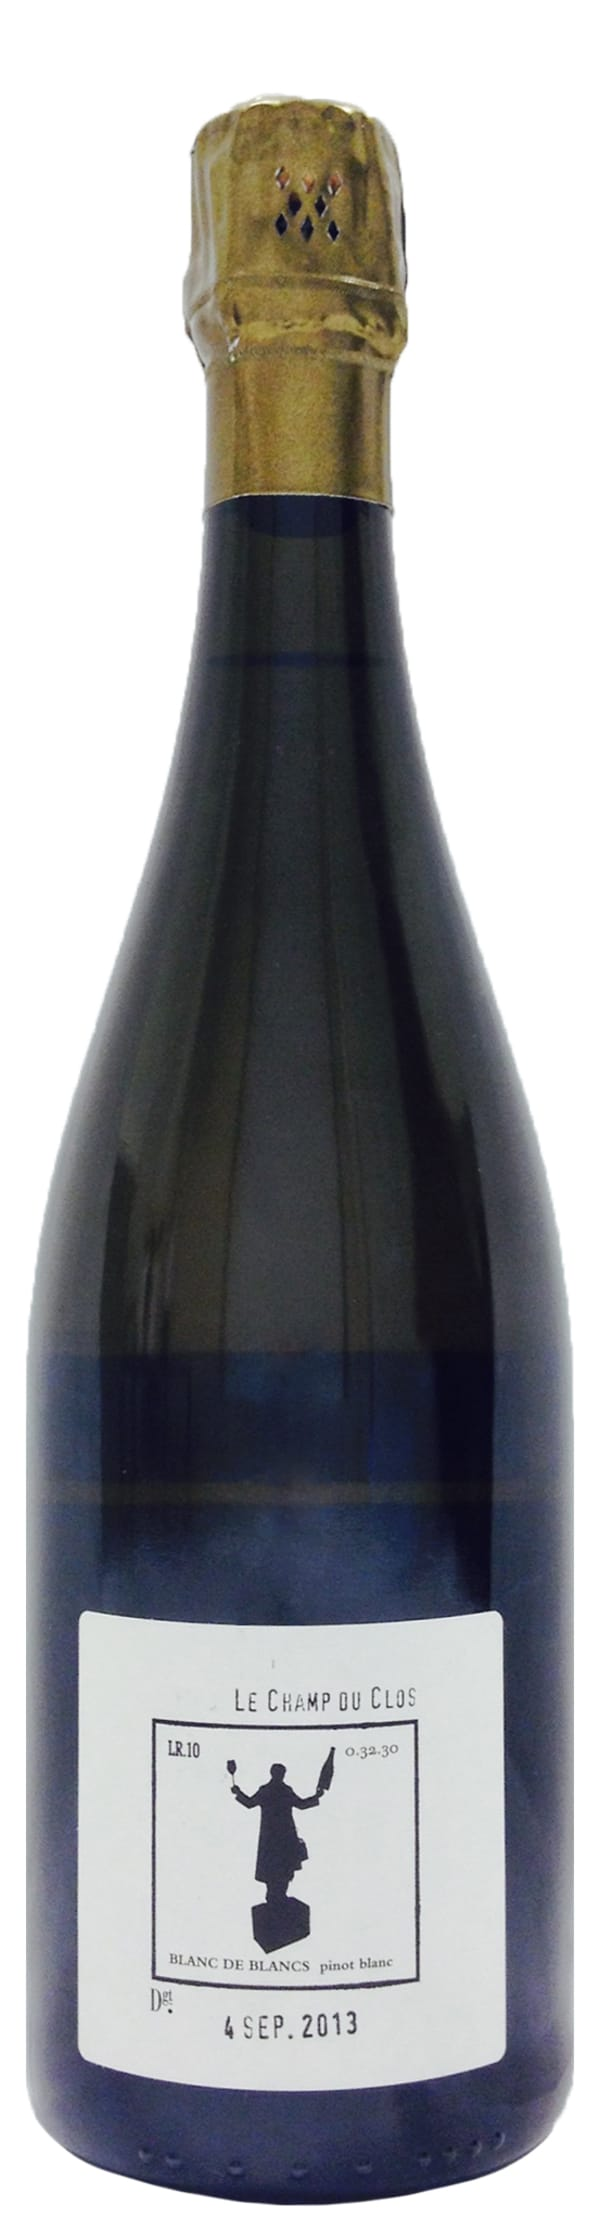 Charles Dufour Le Champ du Clos Pinot Blanc Champagne Brut Nature